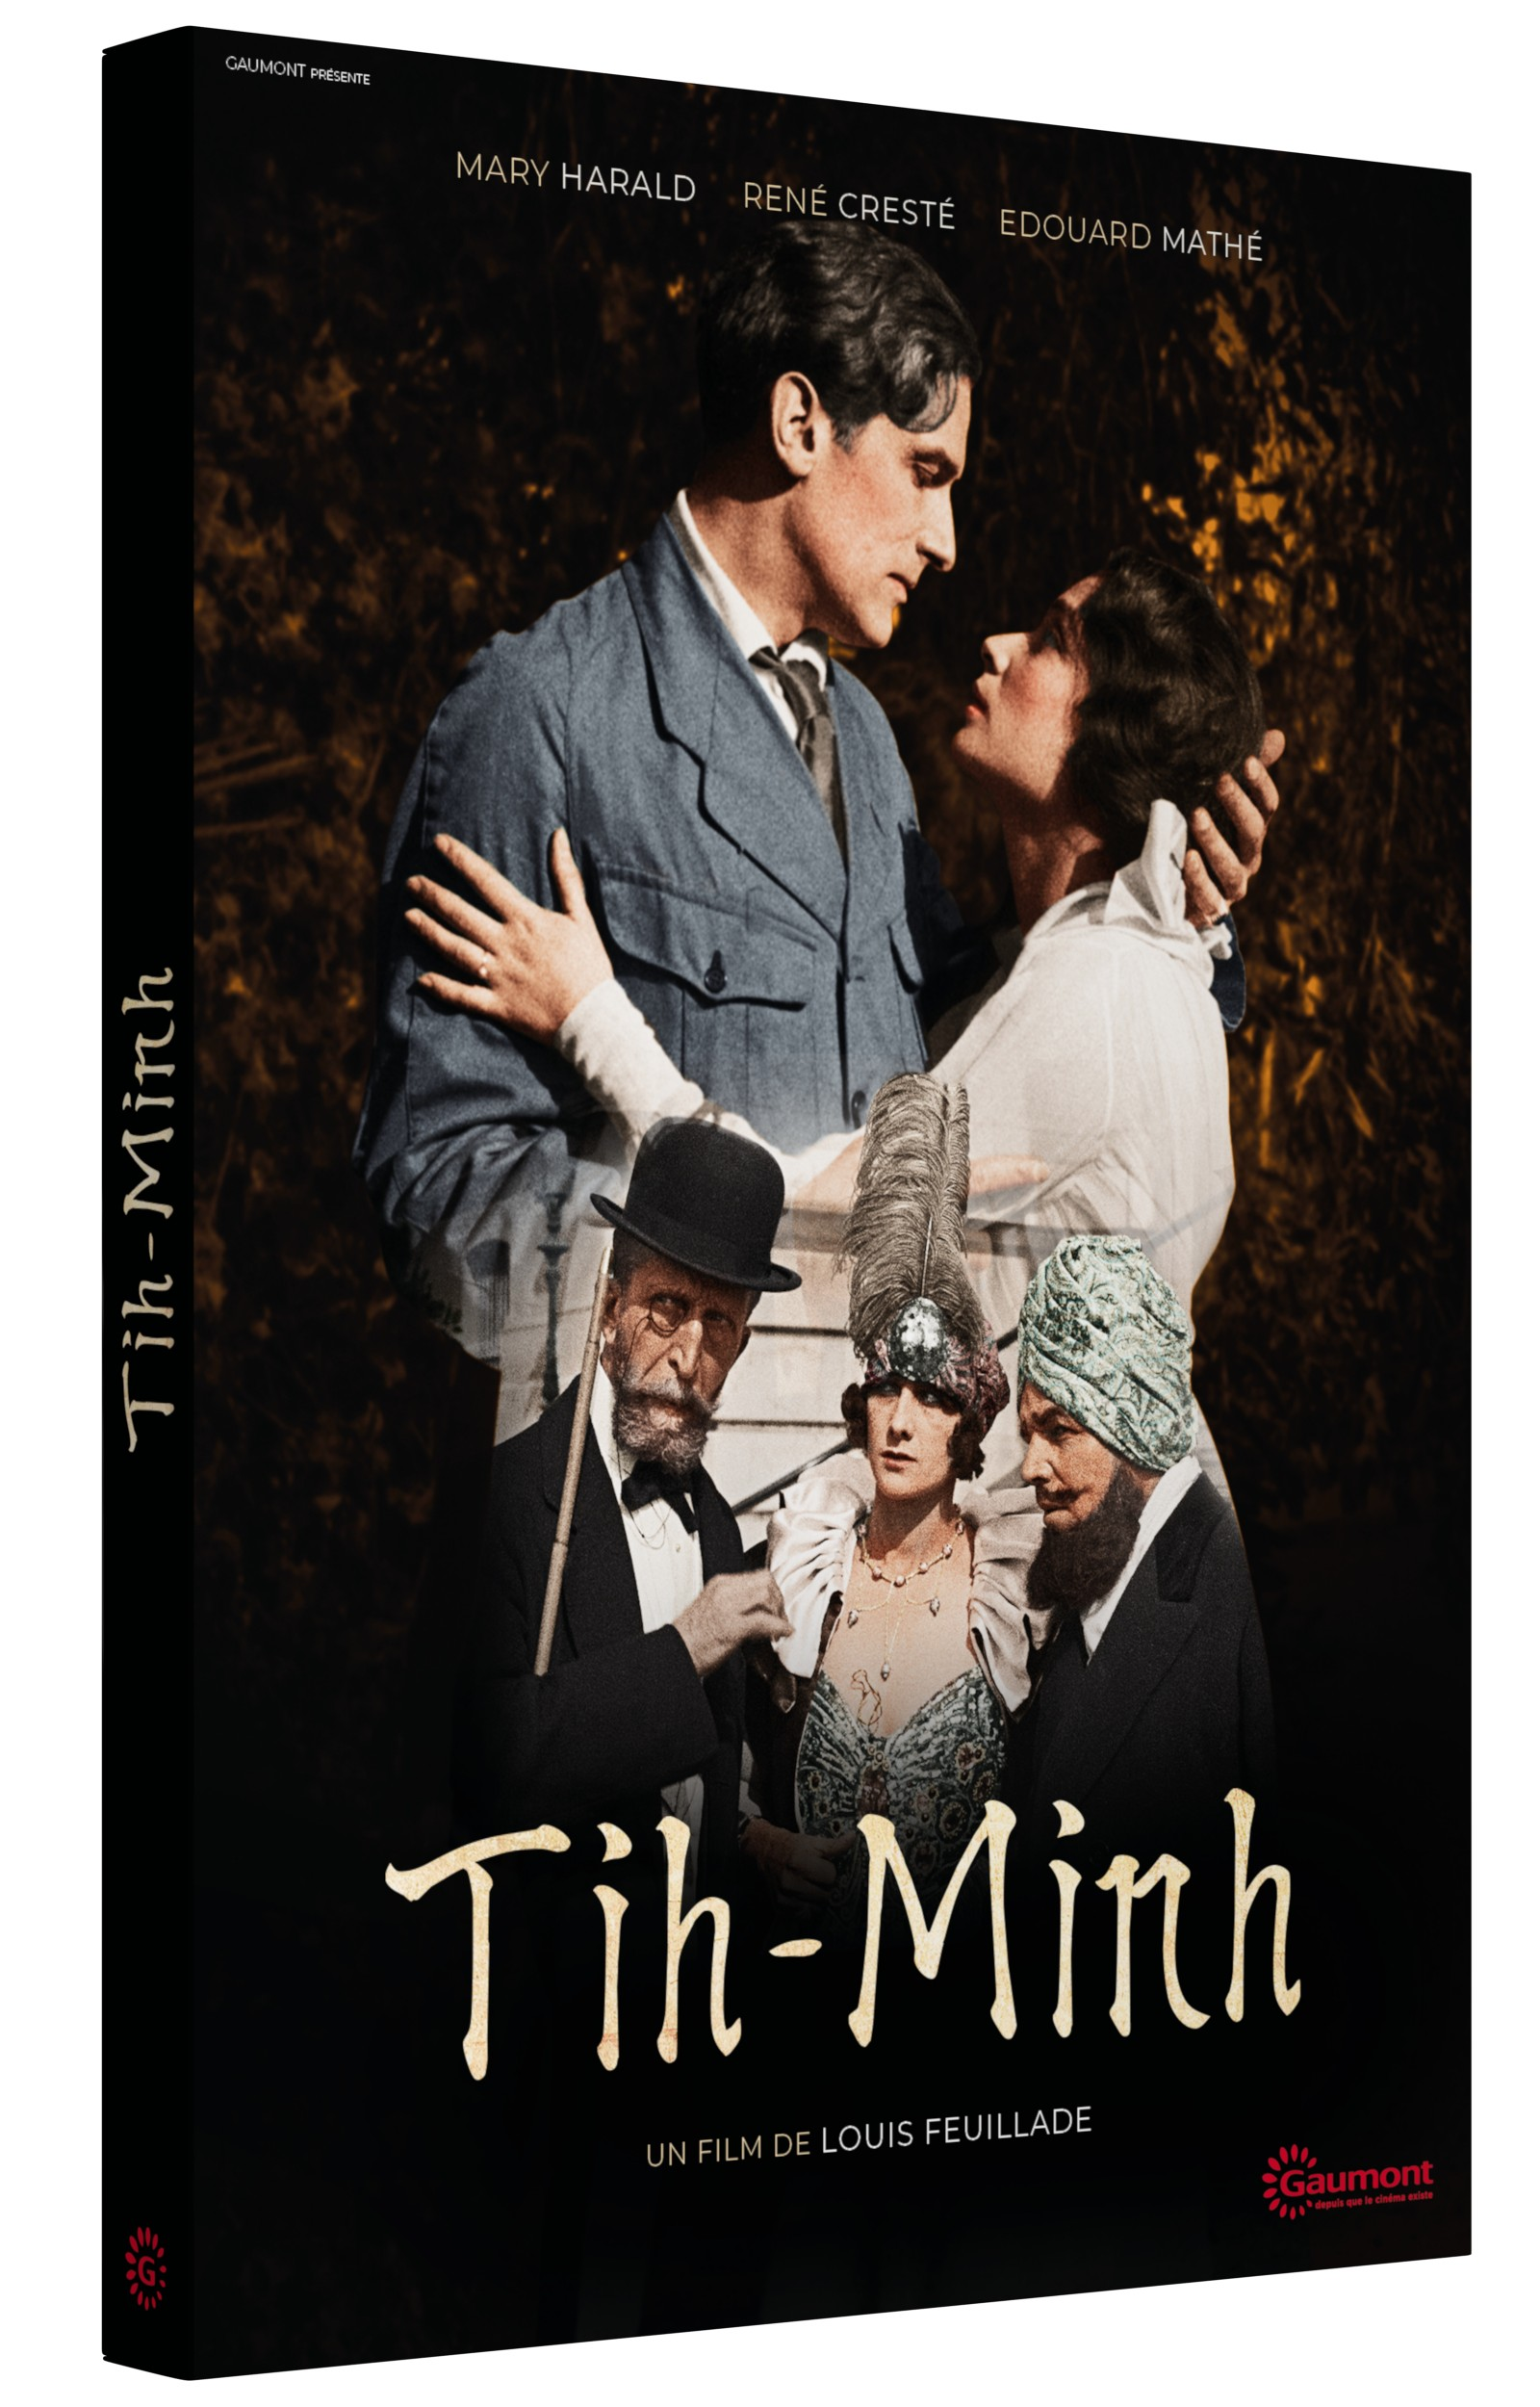 TIH-MINH